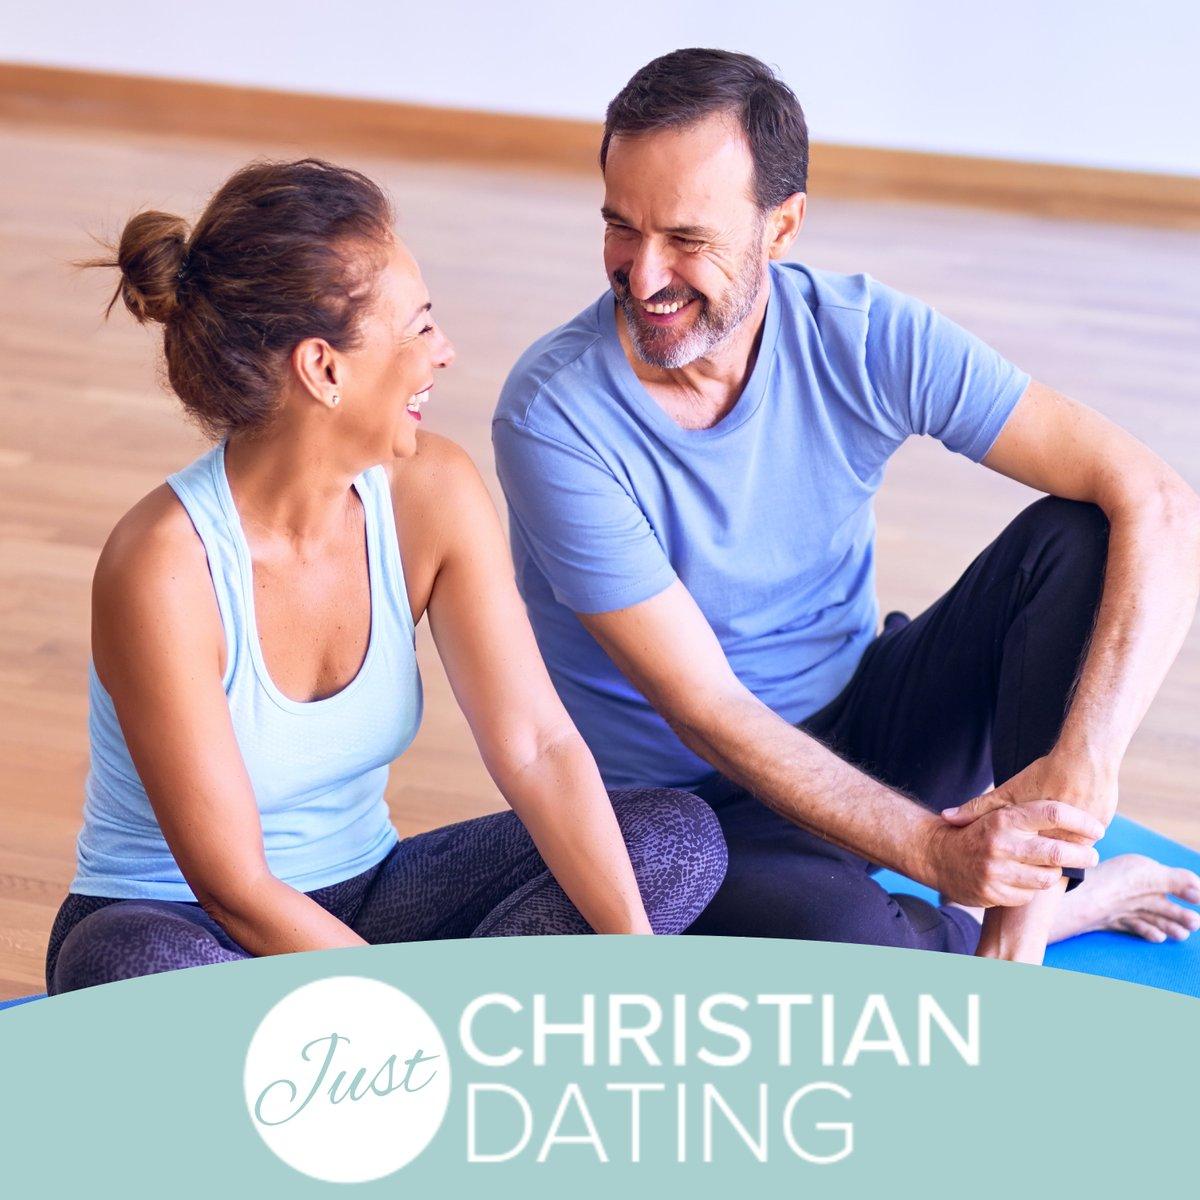 Just christian dating.com dating older women cougar